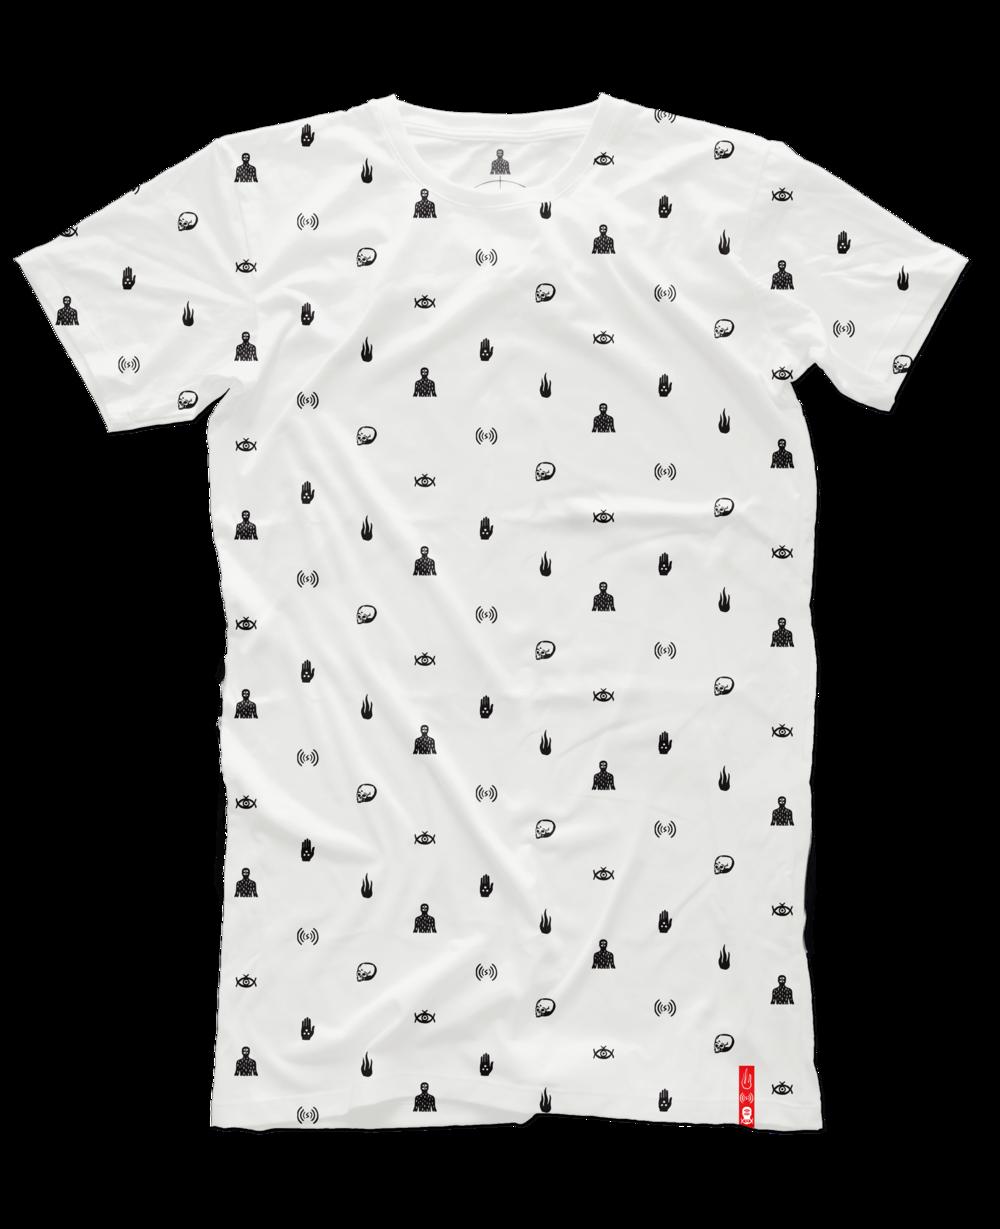 Six Symbols T White All Over Print Barclay Crenshaw